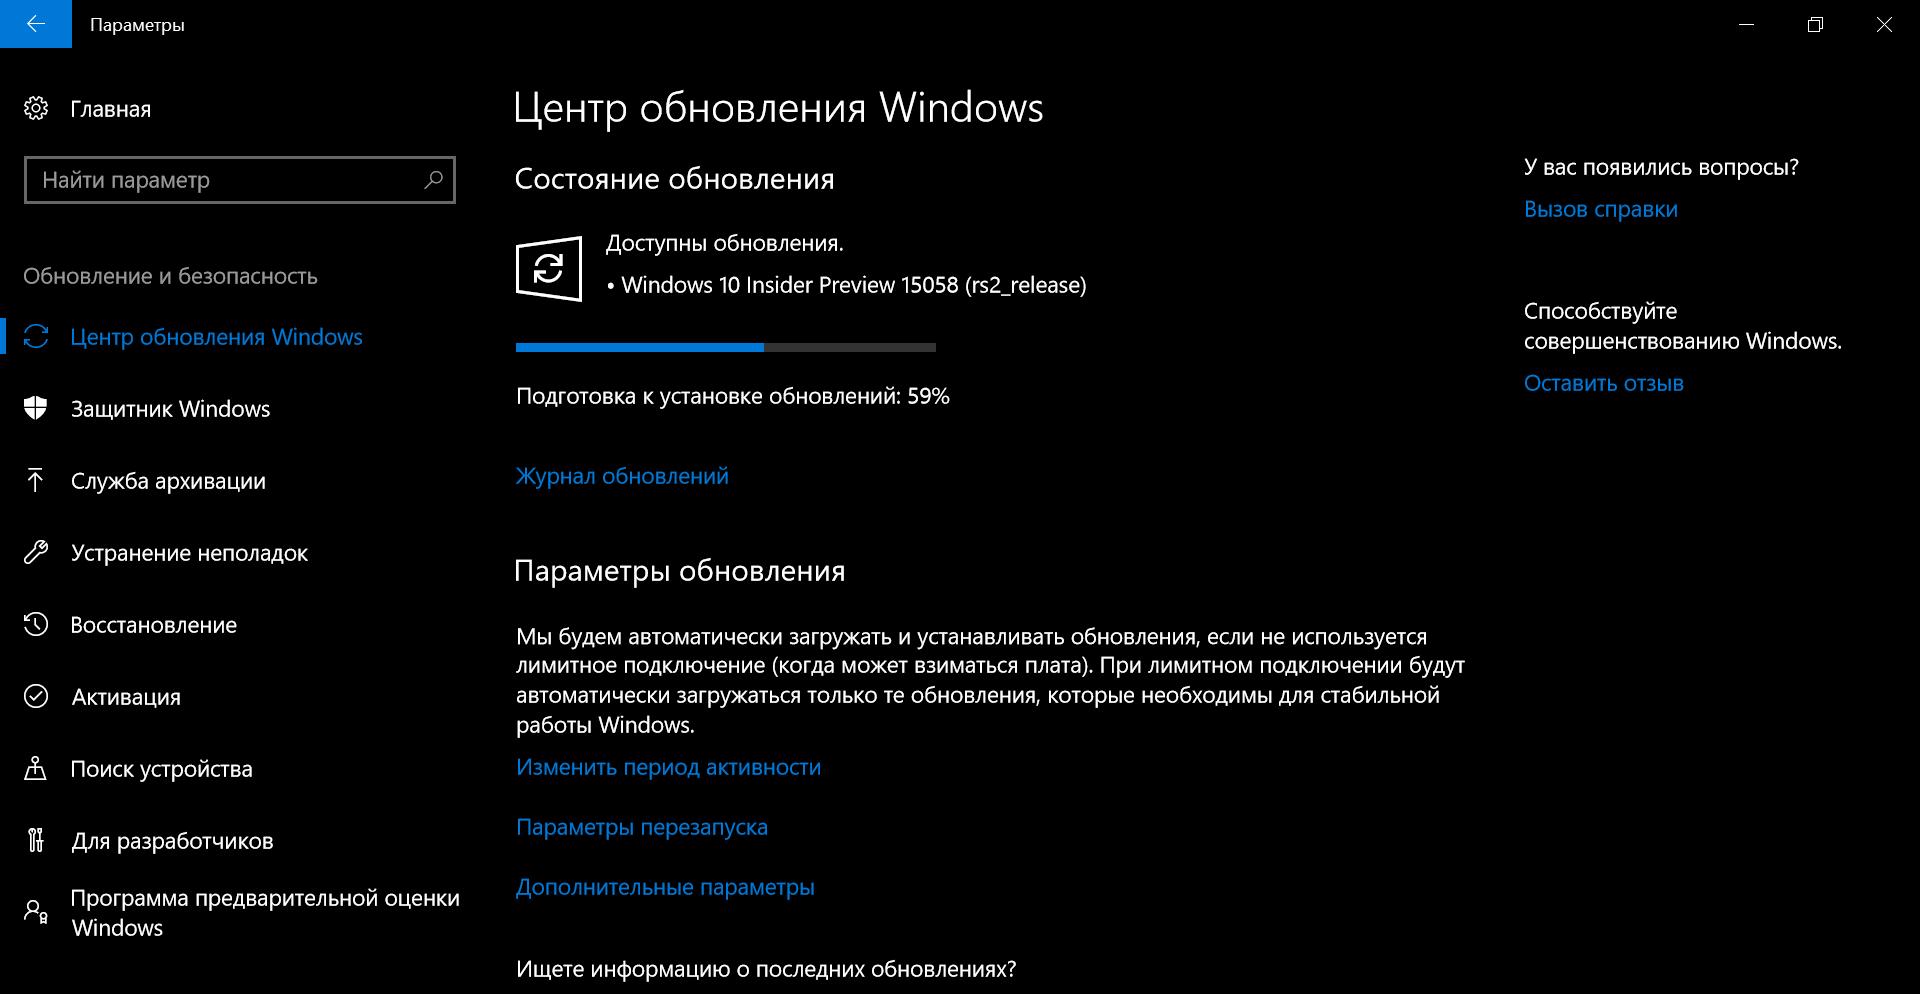 11апреля Microsoft начнёт распространение Windows 10 Creators Update